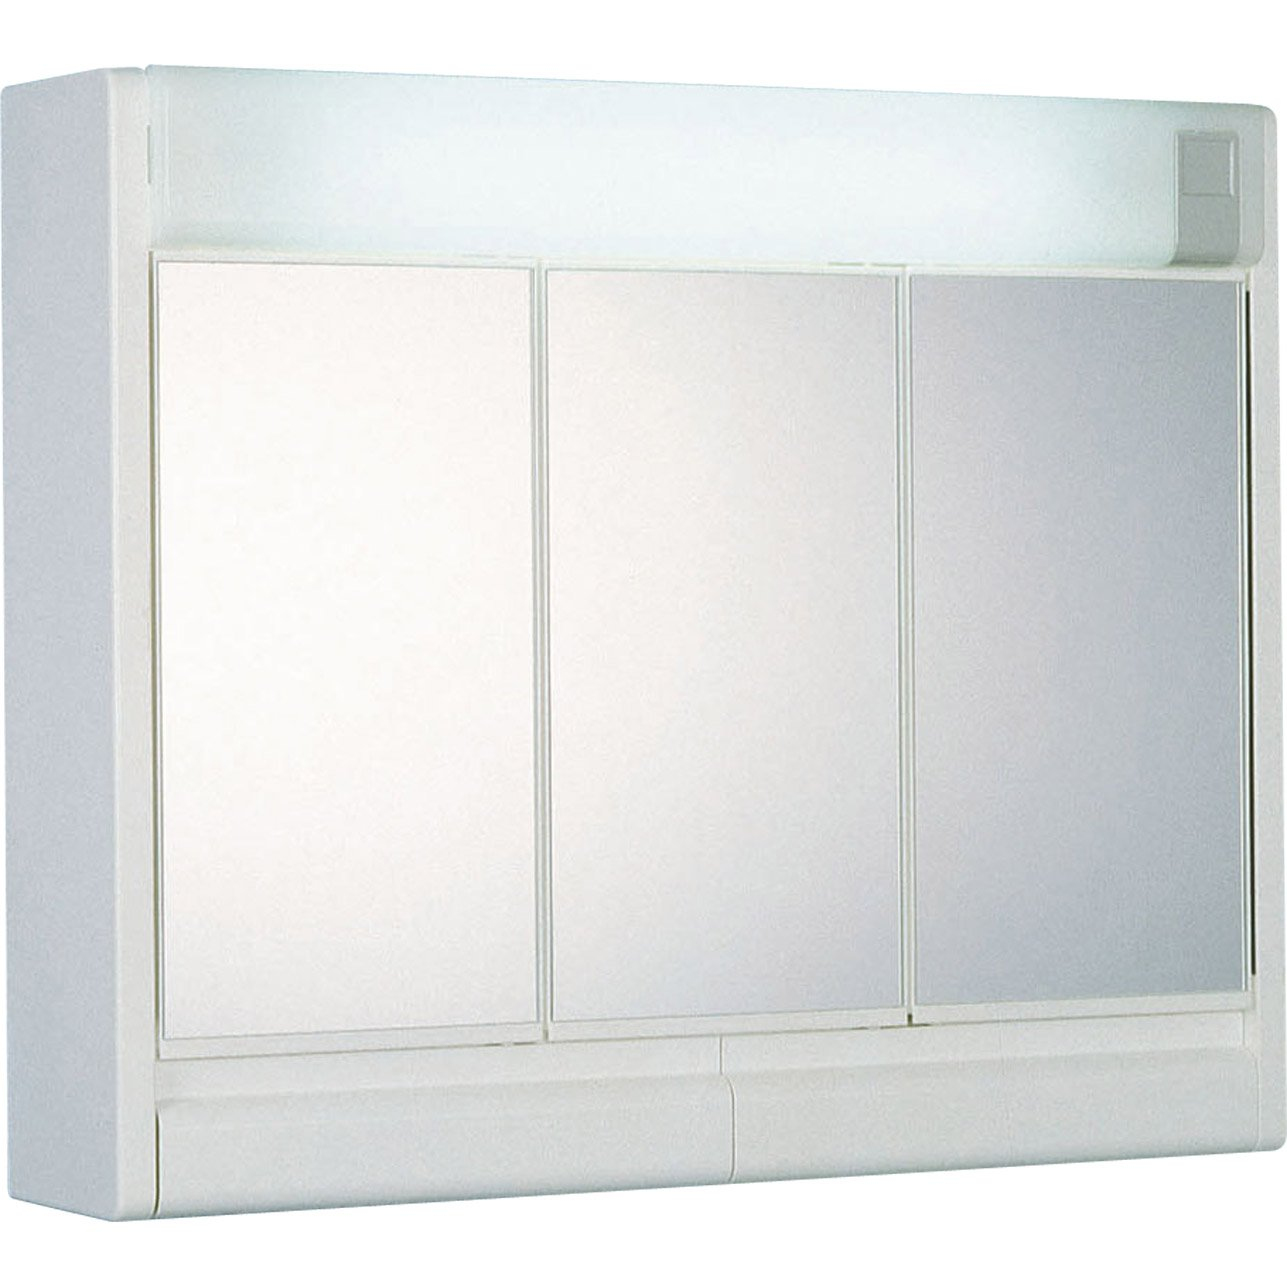 armoire de toilette miroir leroy merlin luxe photos buffet leroy merlin buffet salle manger ikea